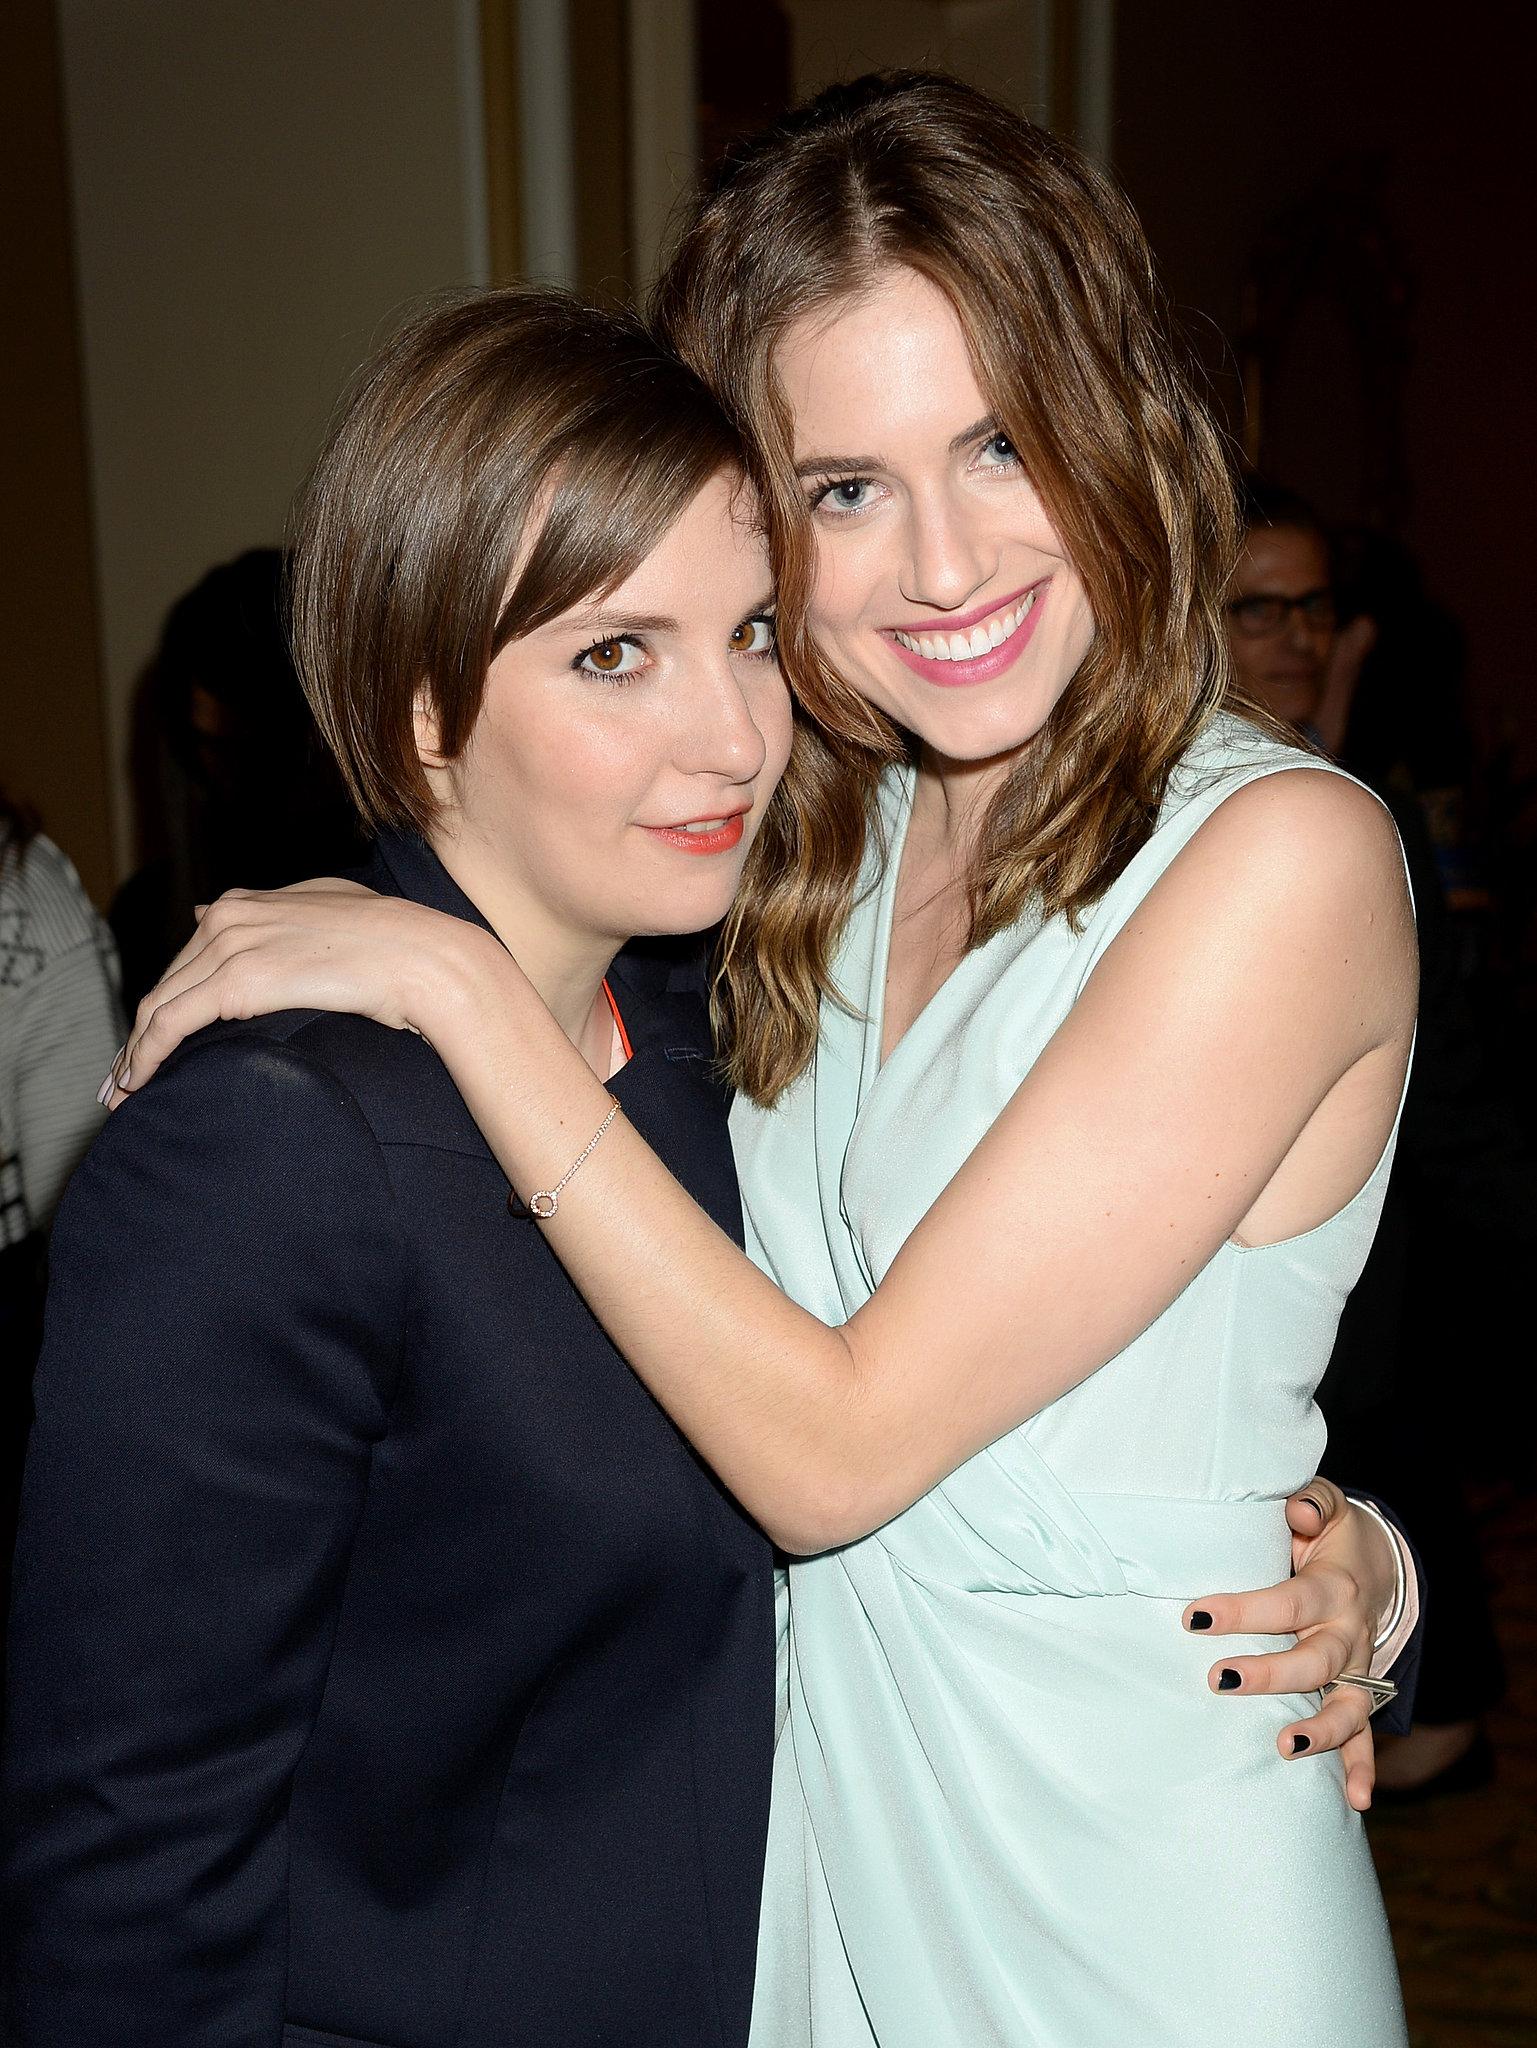 Girls costars Allison Williams and Lena Dunham embraced.